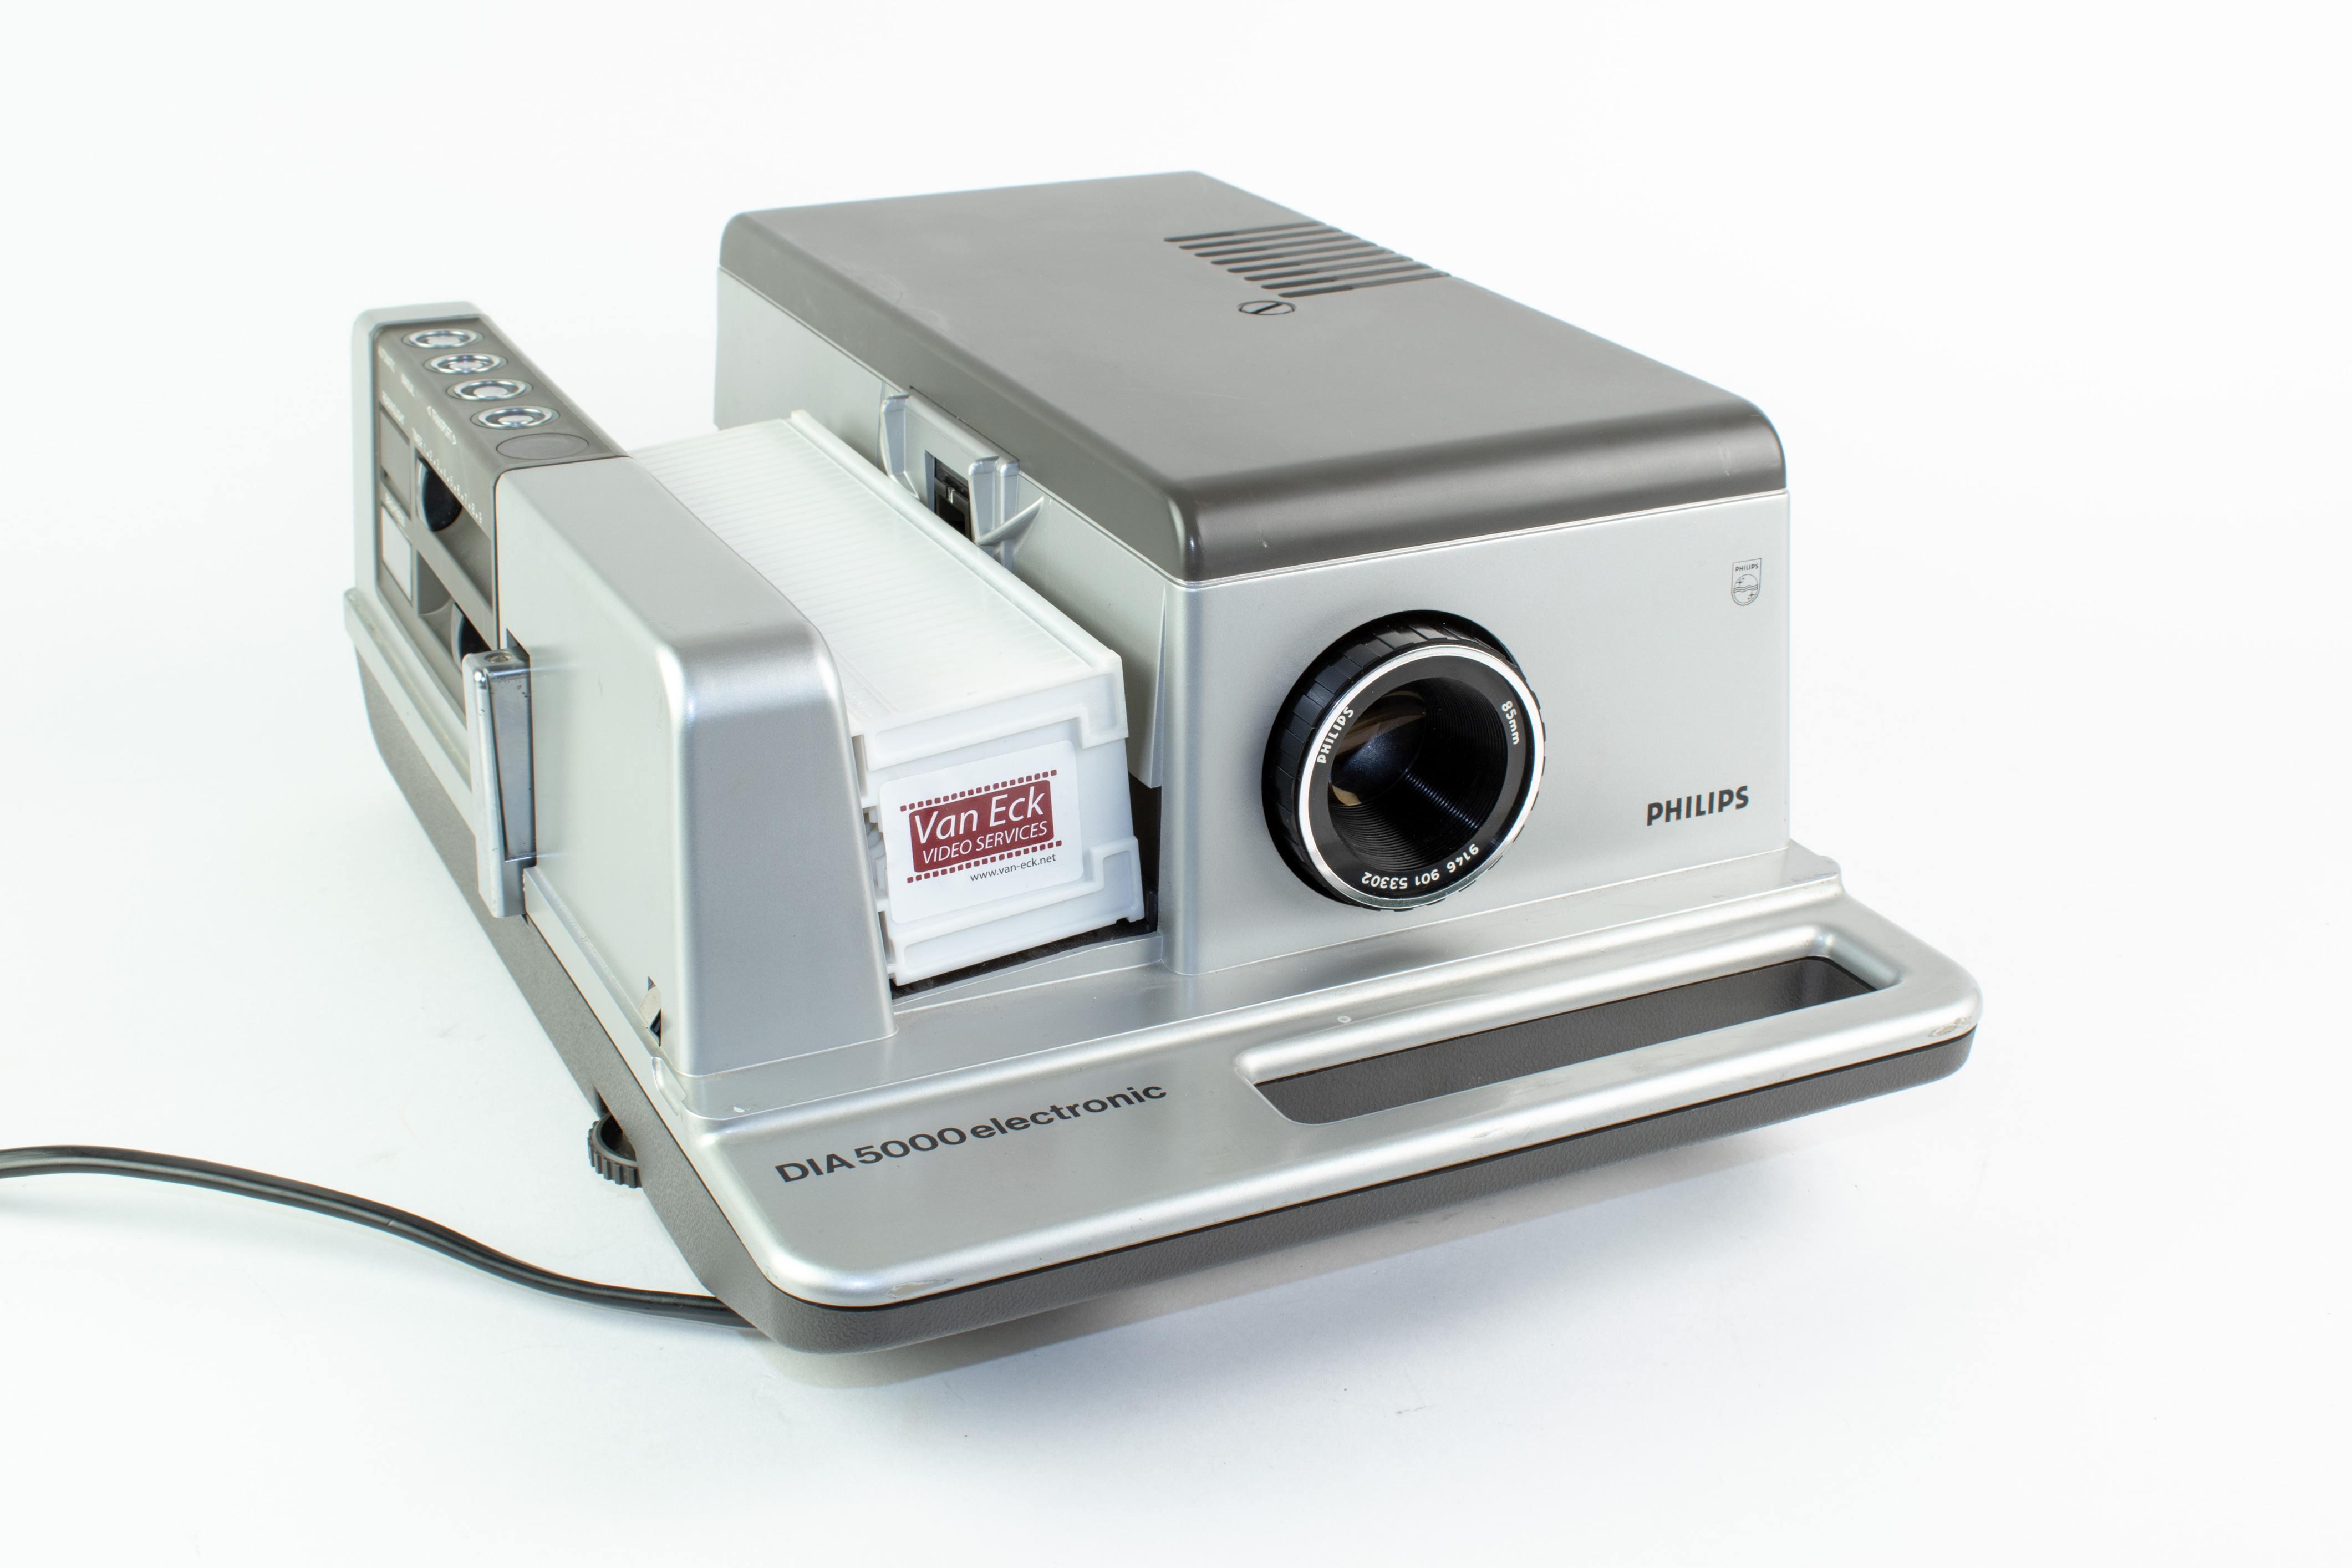 DIA5000 electronic